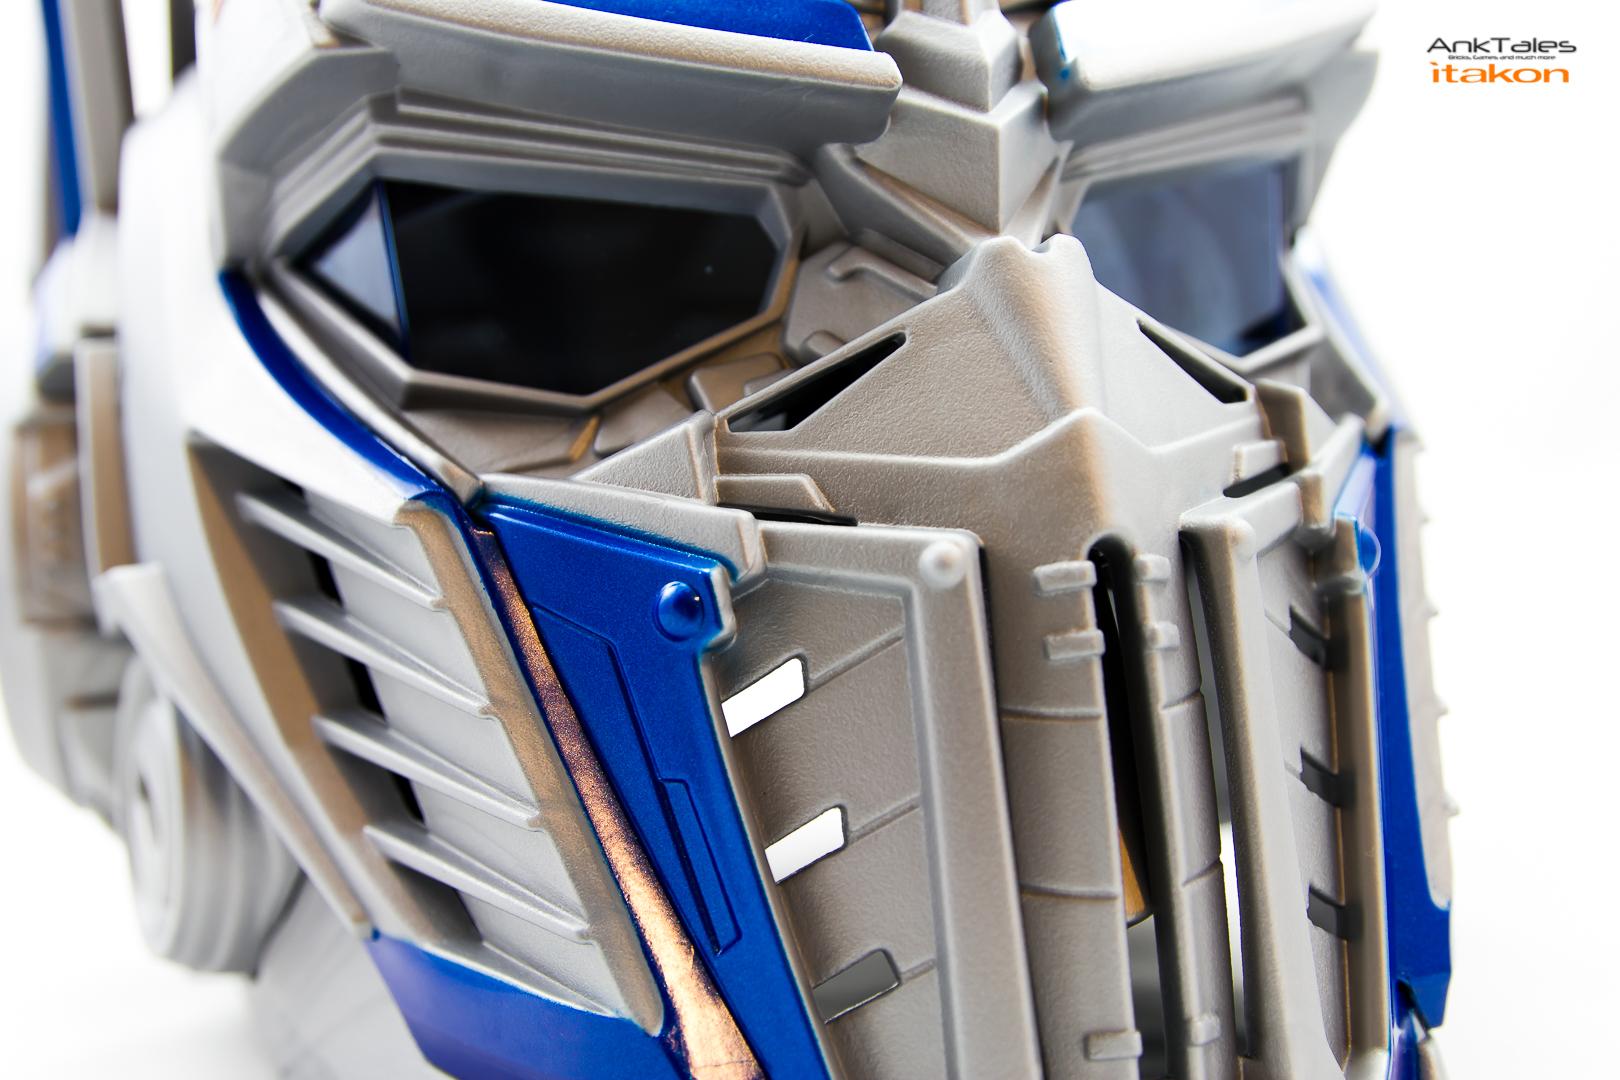 Link a Hasbro Optimus Prime helmet Anktales Itakon_0031